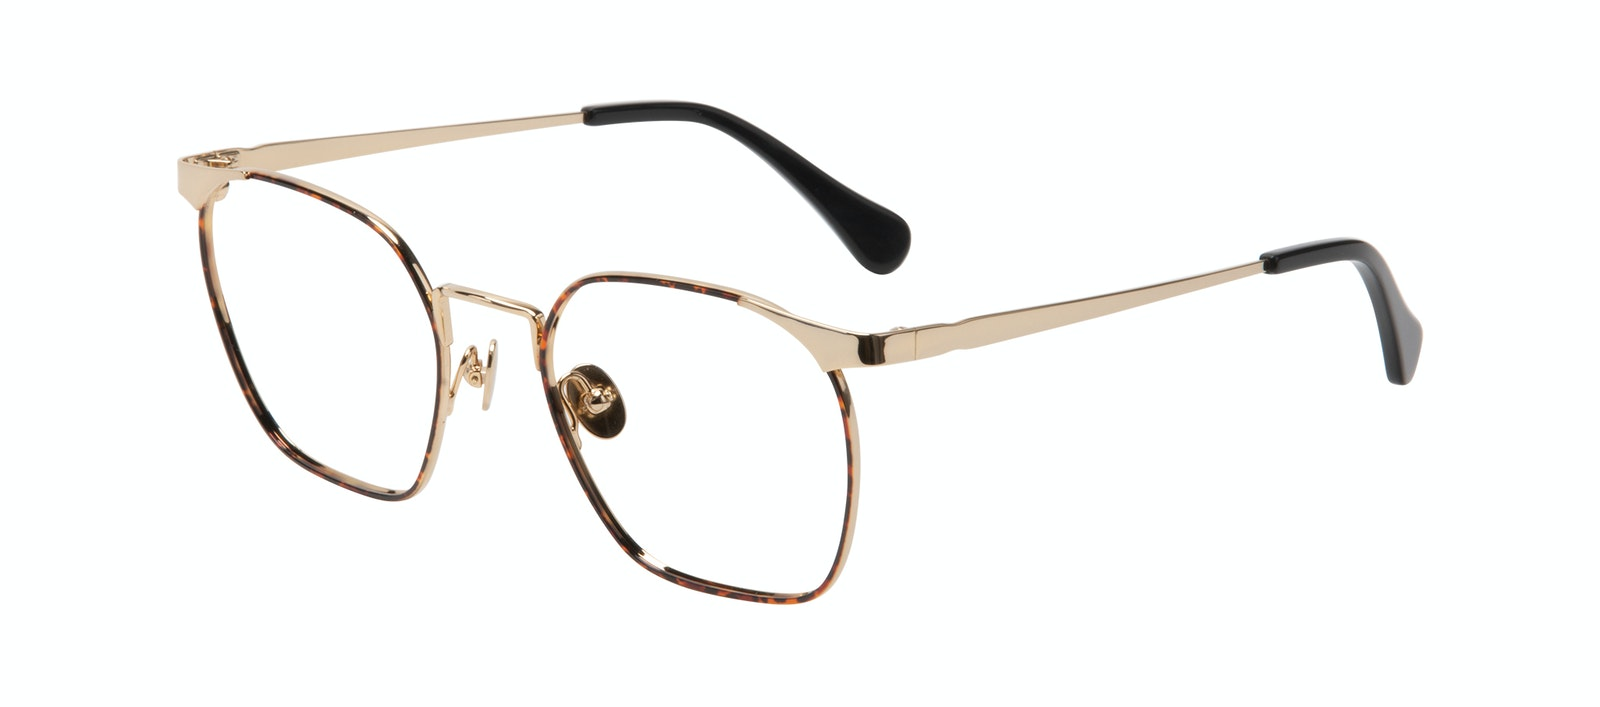 Affordable Fashion Glasses Square Eyeglasses Women Artsy Gold Tort Tilt